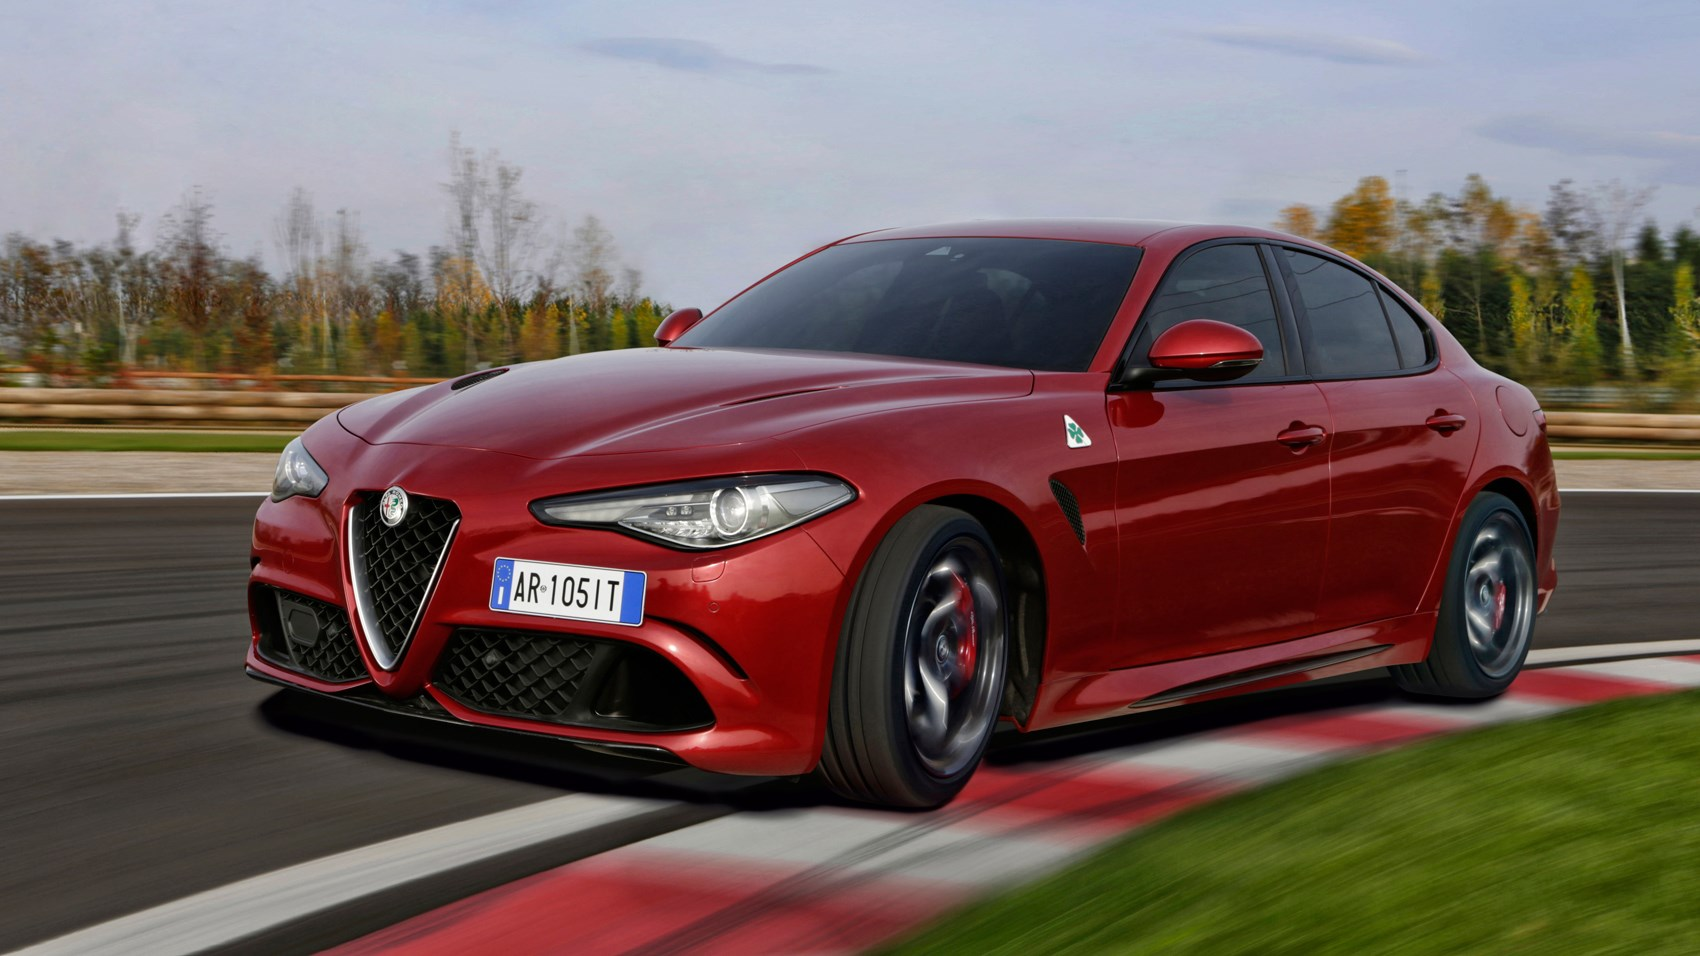 Alfa Romeo Giulia Quadrifoglio Review CAR Magazine - Alfa romeo car prices